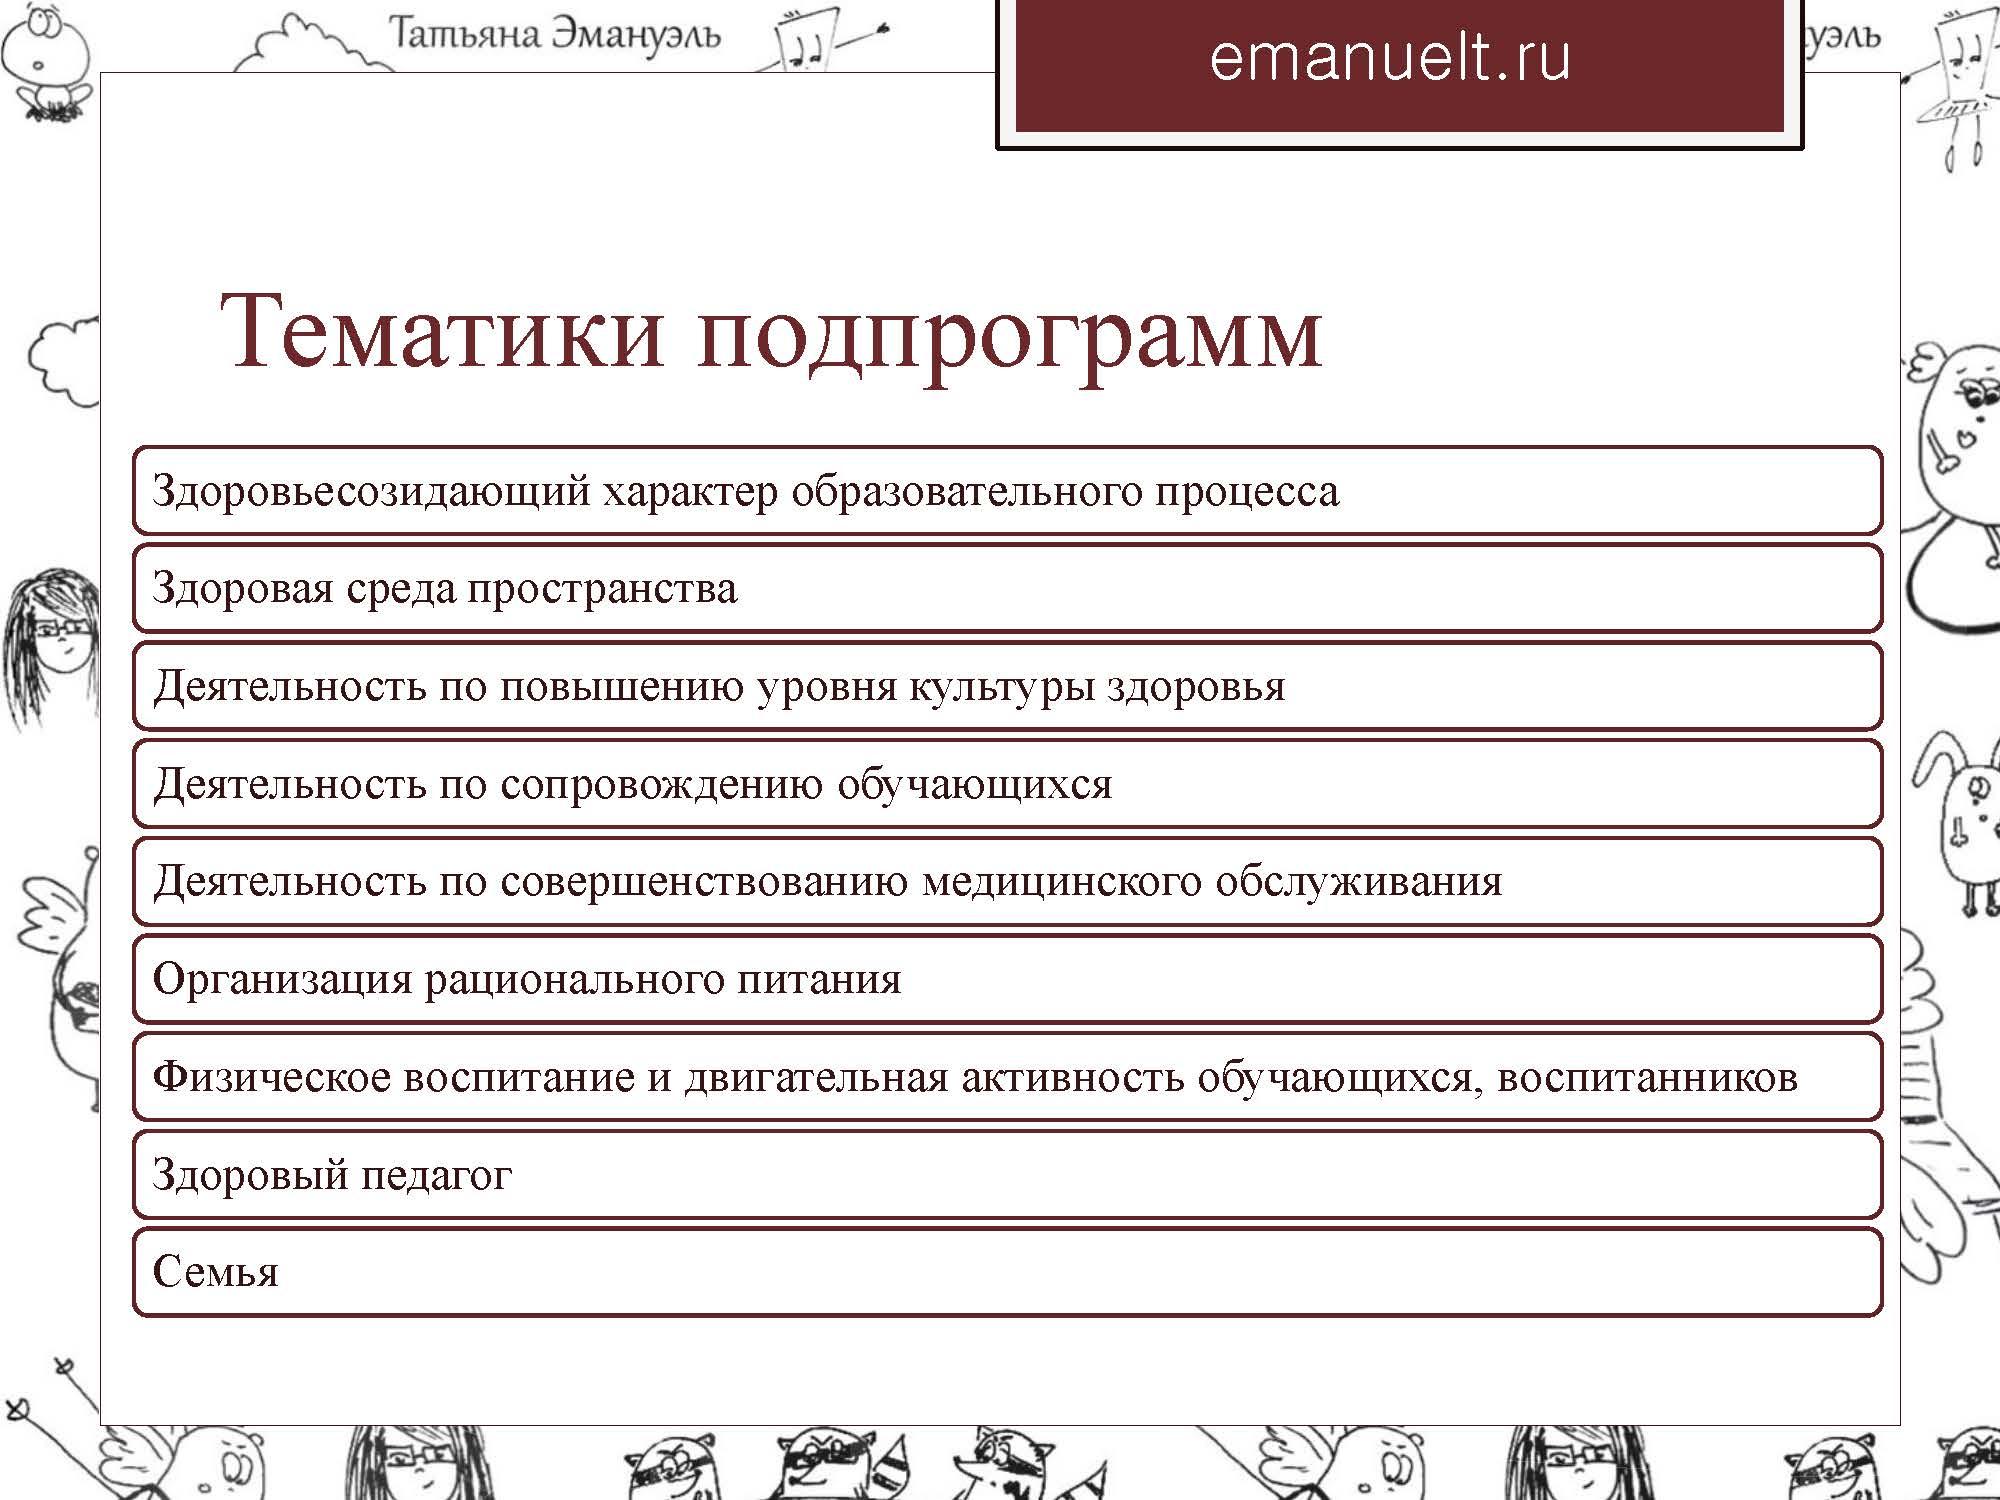 06 февраля эмануэль_Страница_030